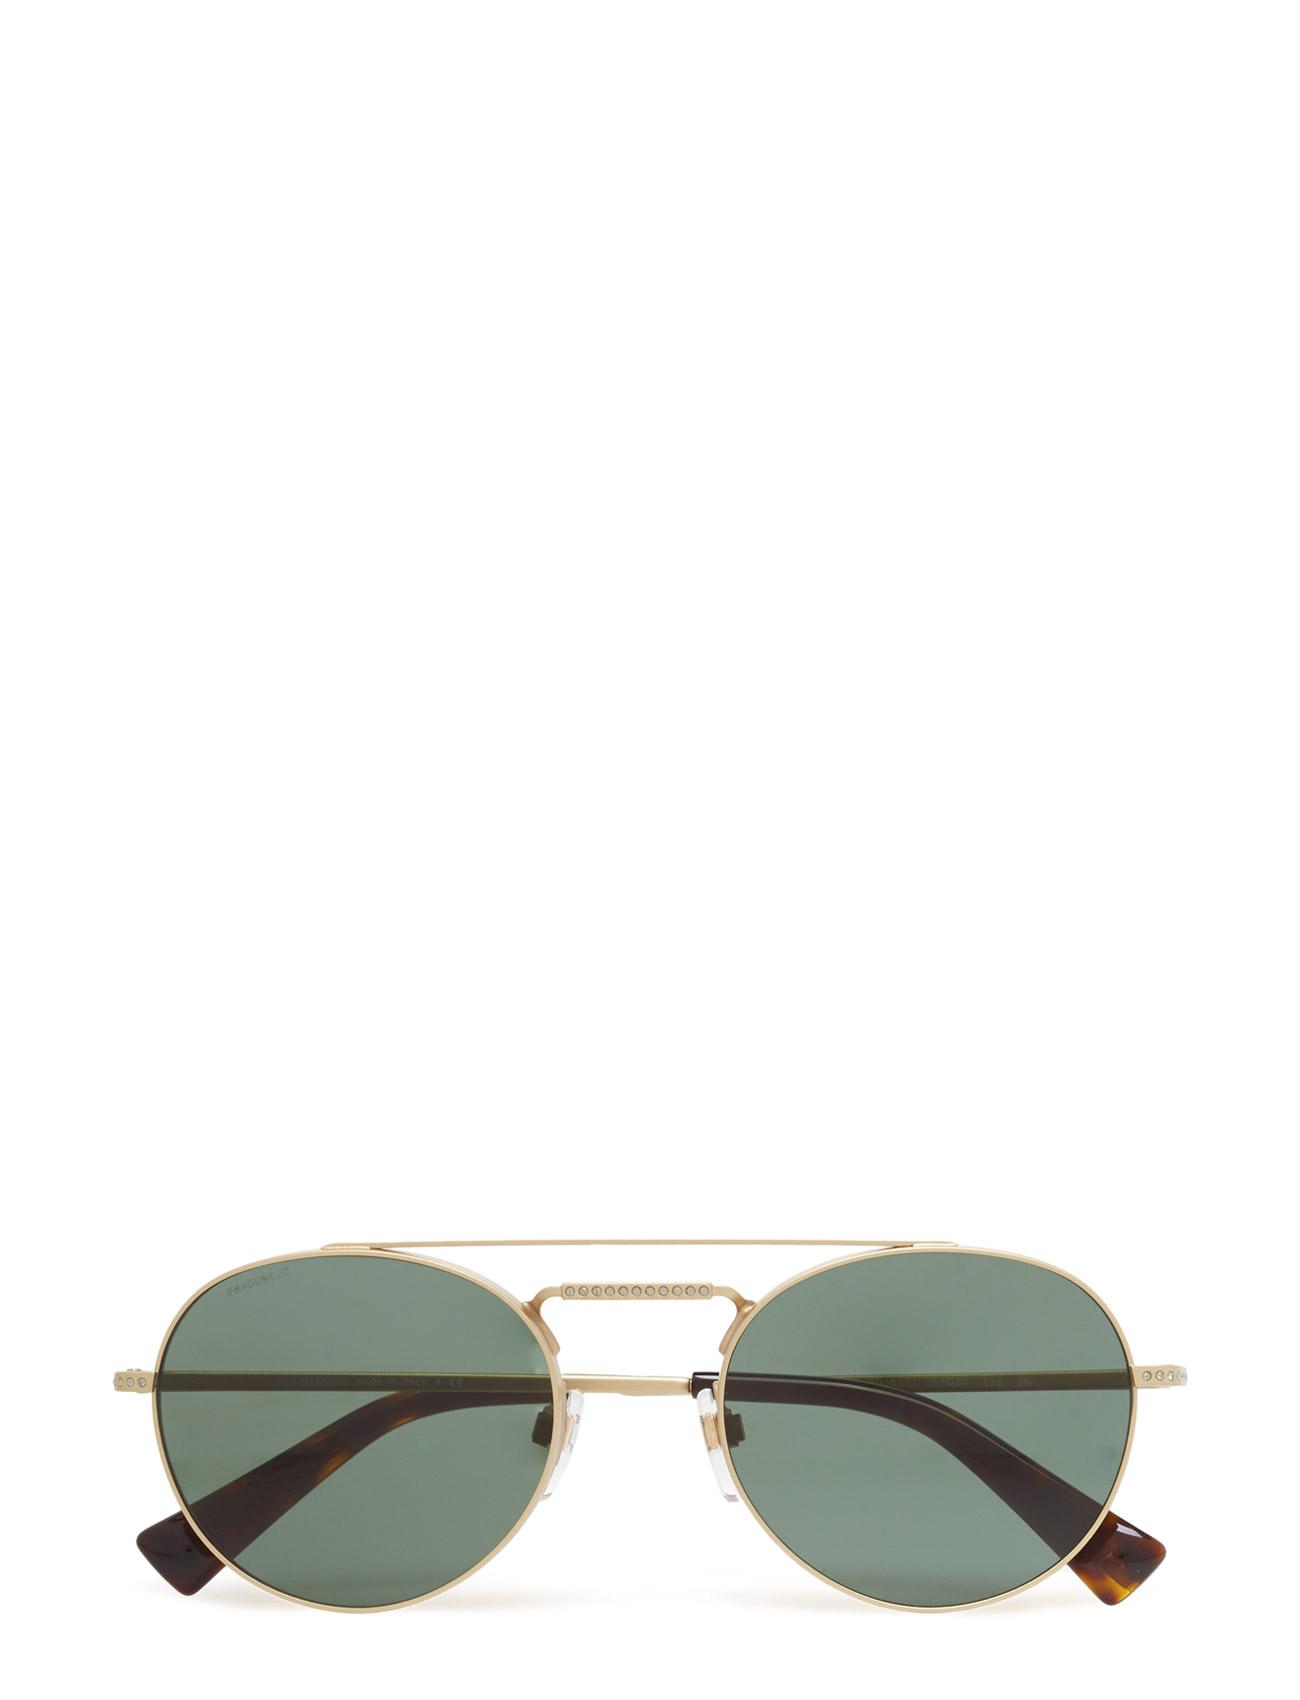 valentino sunglasses – Glamtech fra boozt.com dk